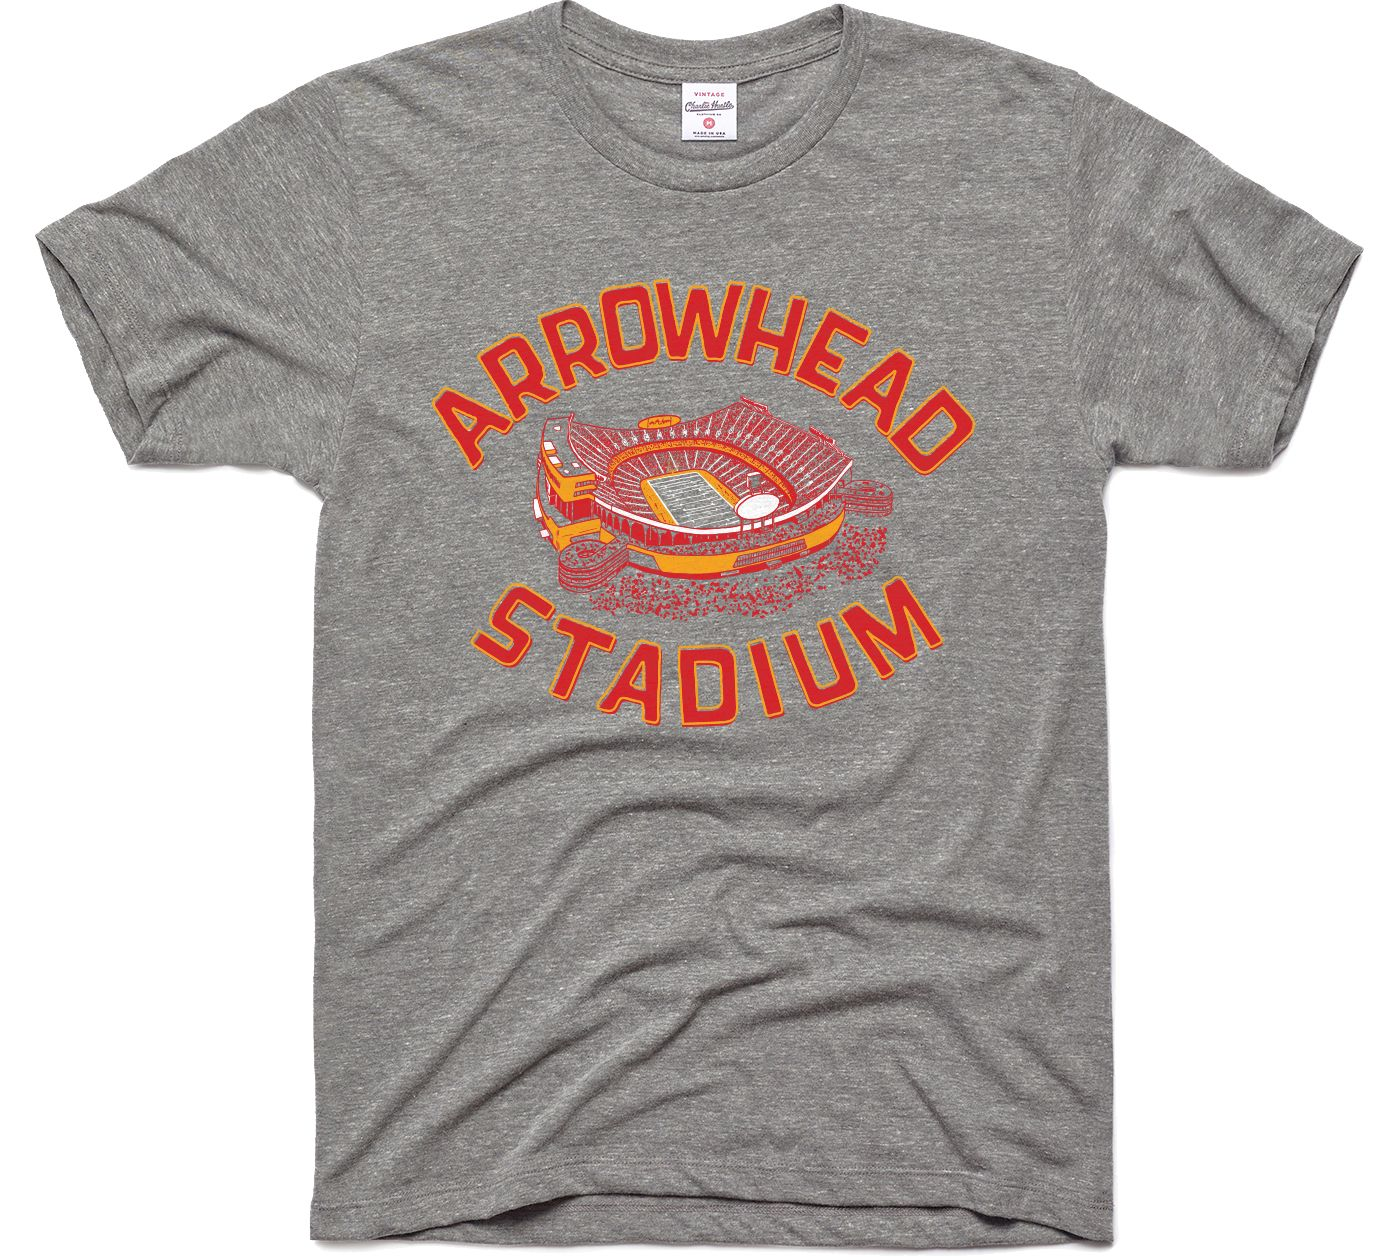 Charlie Hustle Men's Arrowhead Stadium Vintage Grey T-Shirt